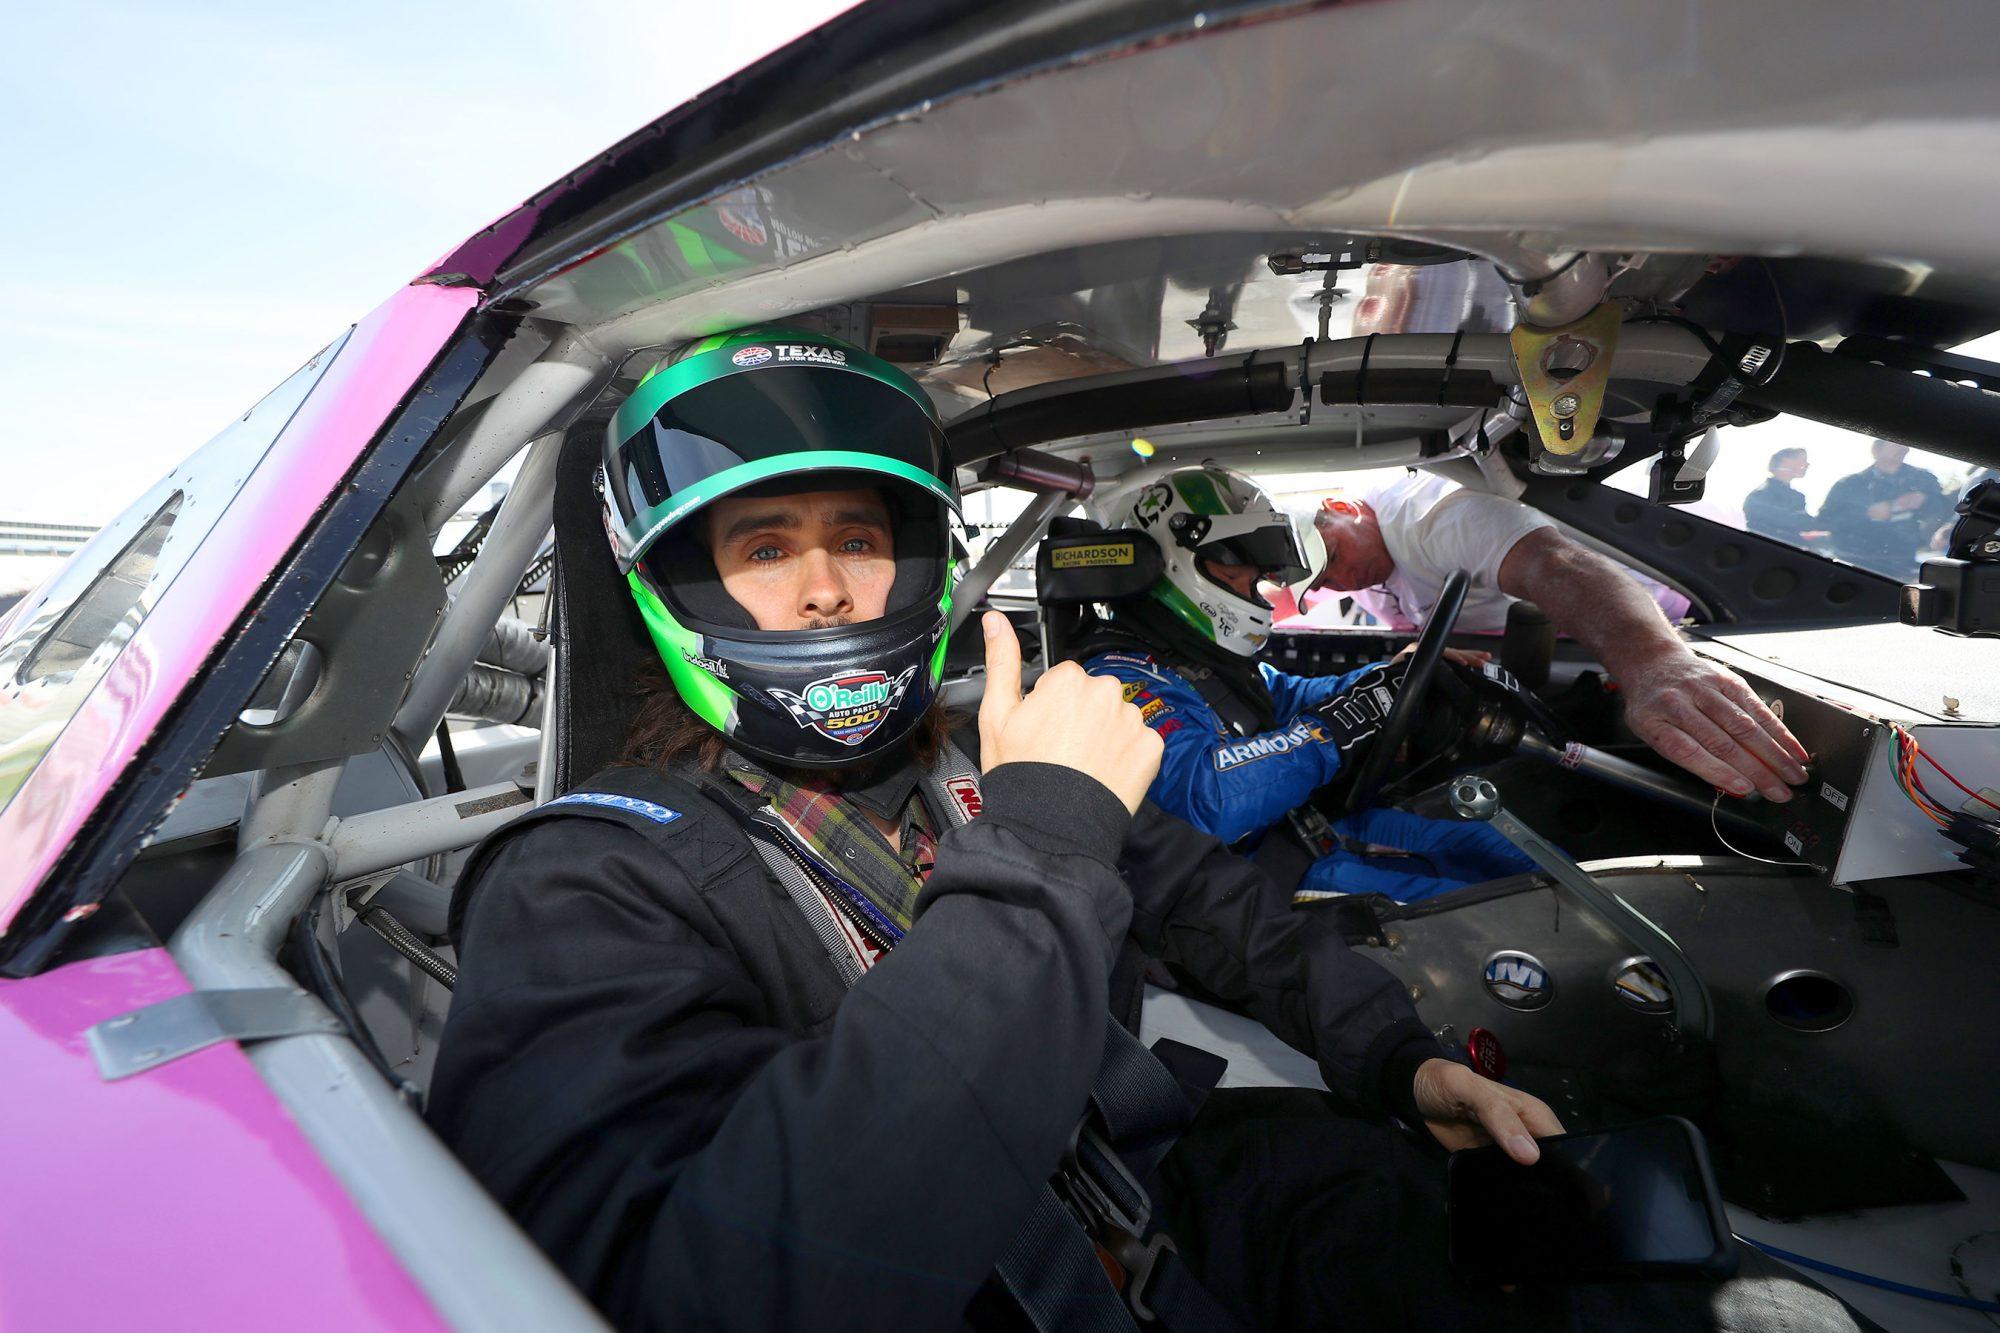 Jared Leto visits Texas Motor Speedway